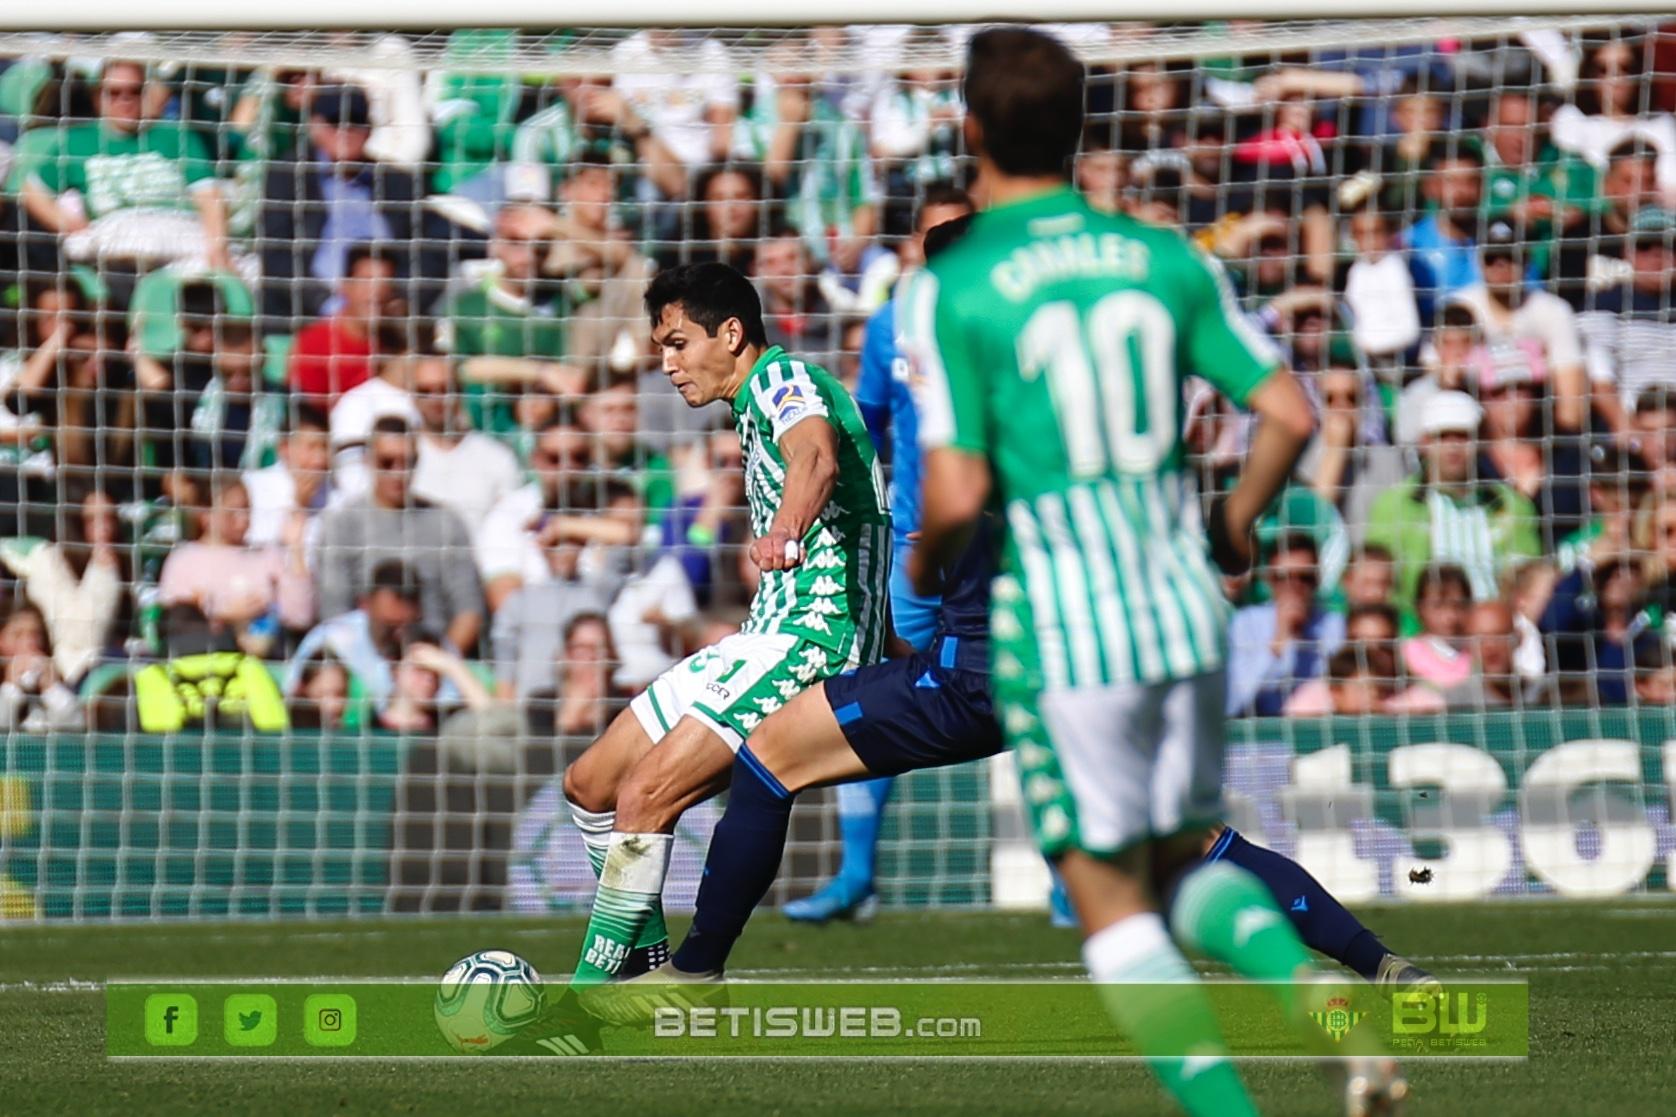 J20 Real Betis - Real Sociedad 10